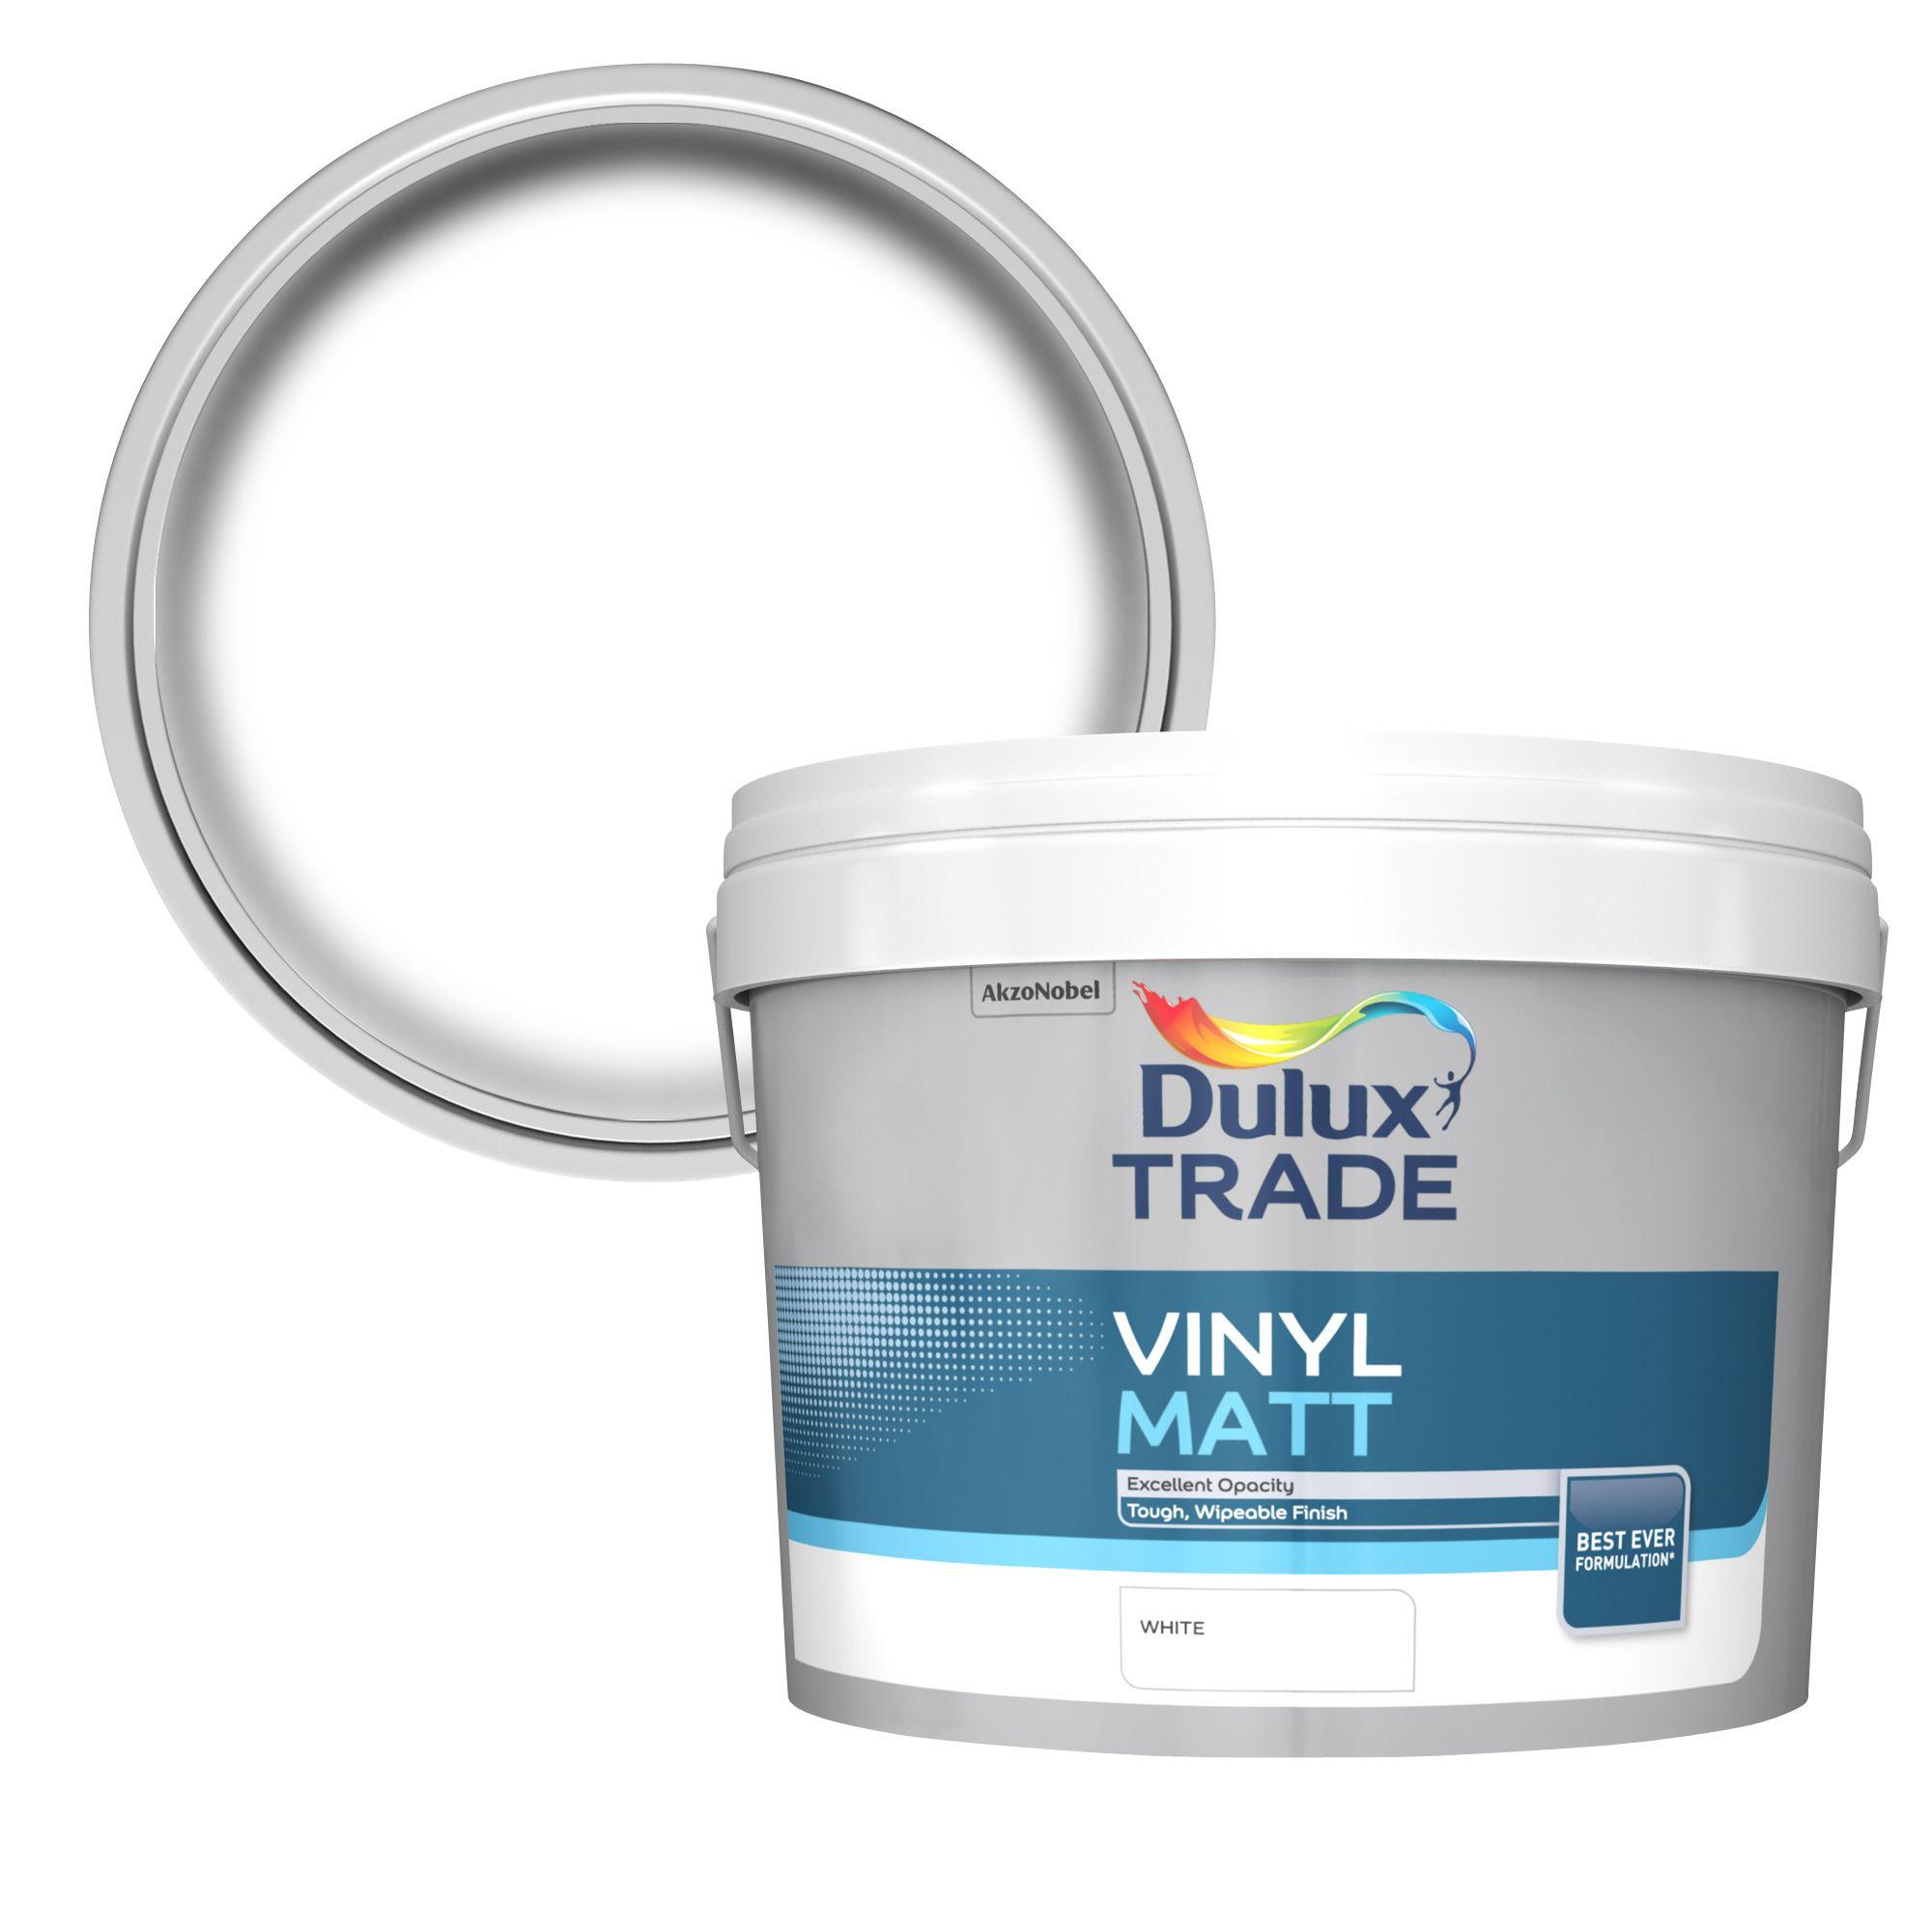 Dulux Trade White Matt Vinyl emulsion paint 10L | Departments | DIY at B&Q